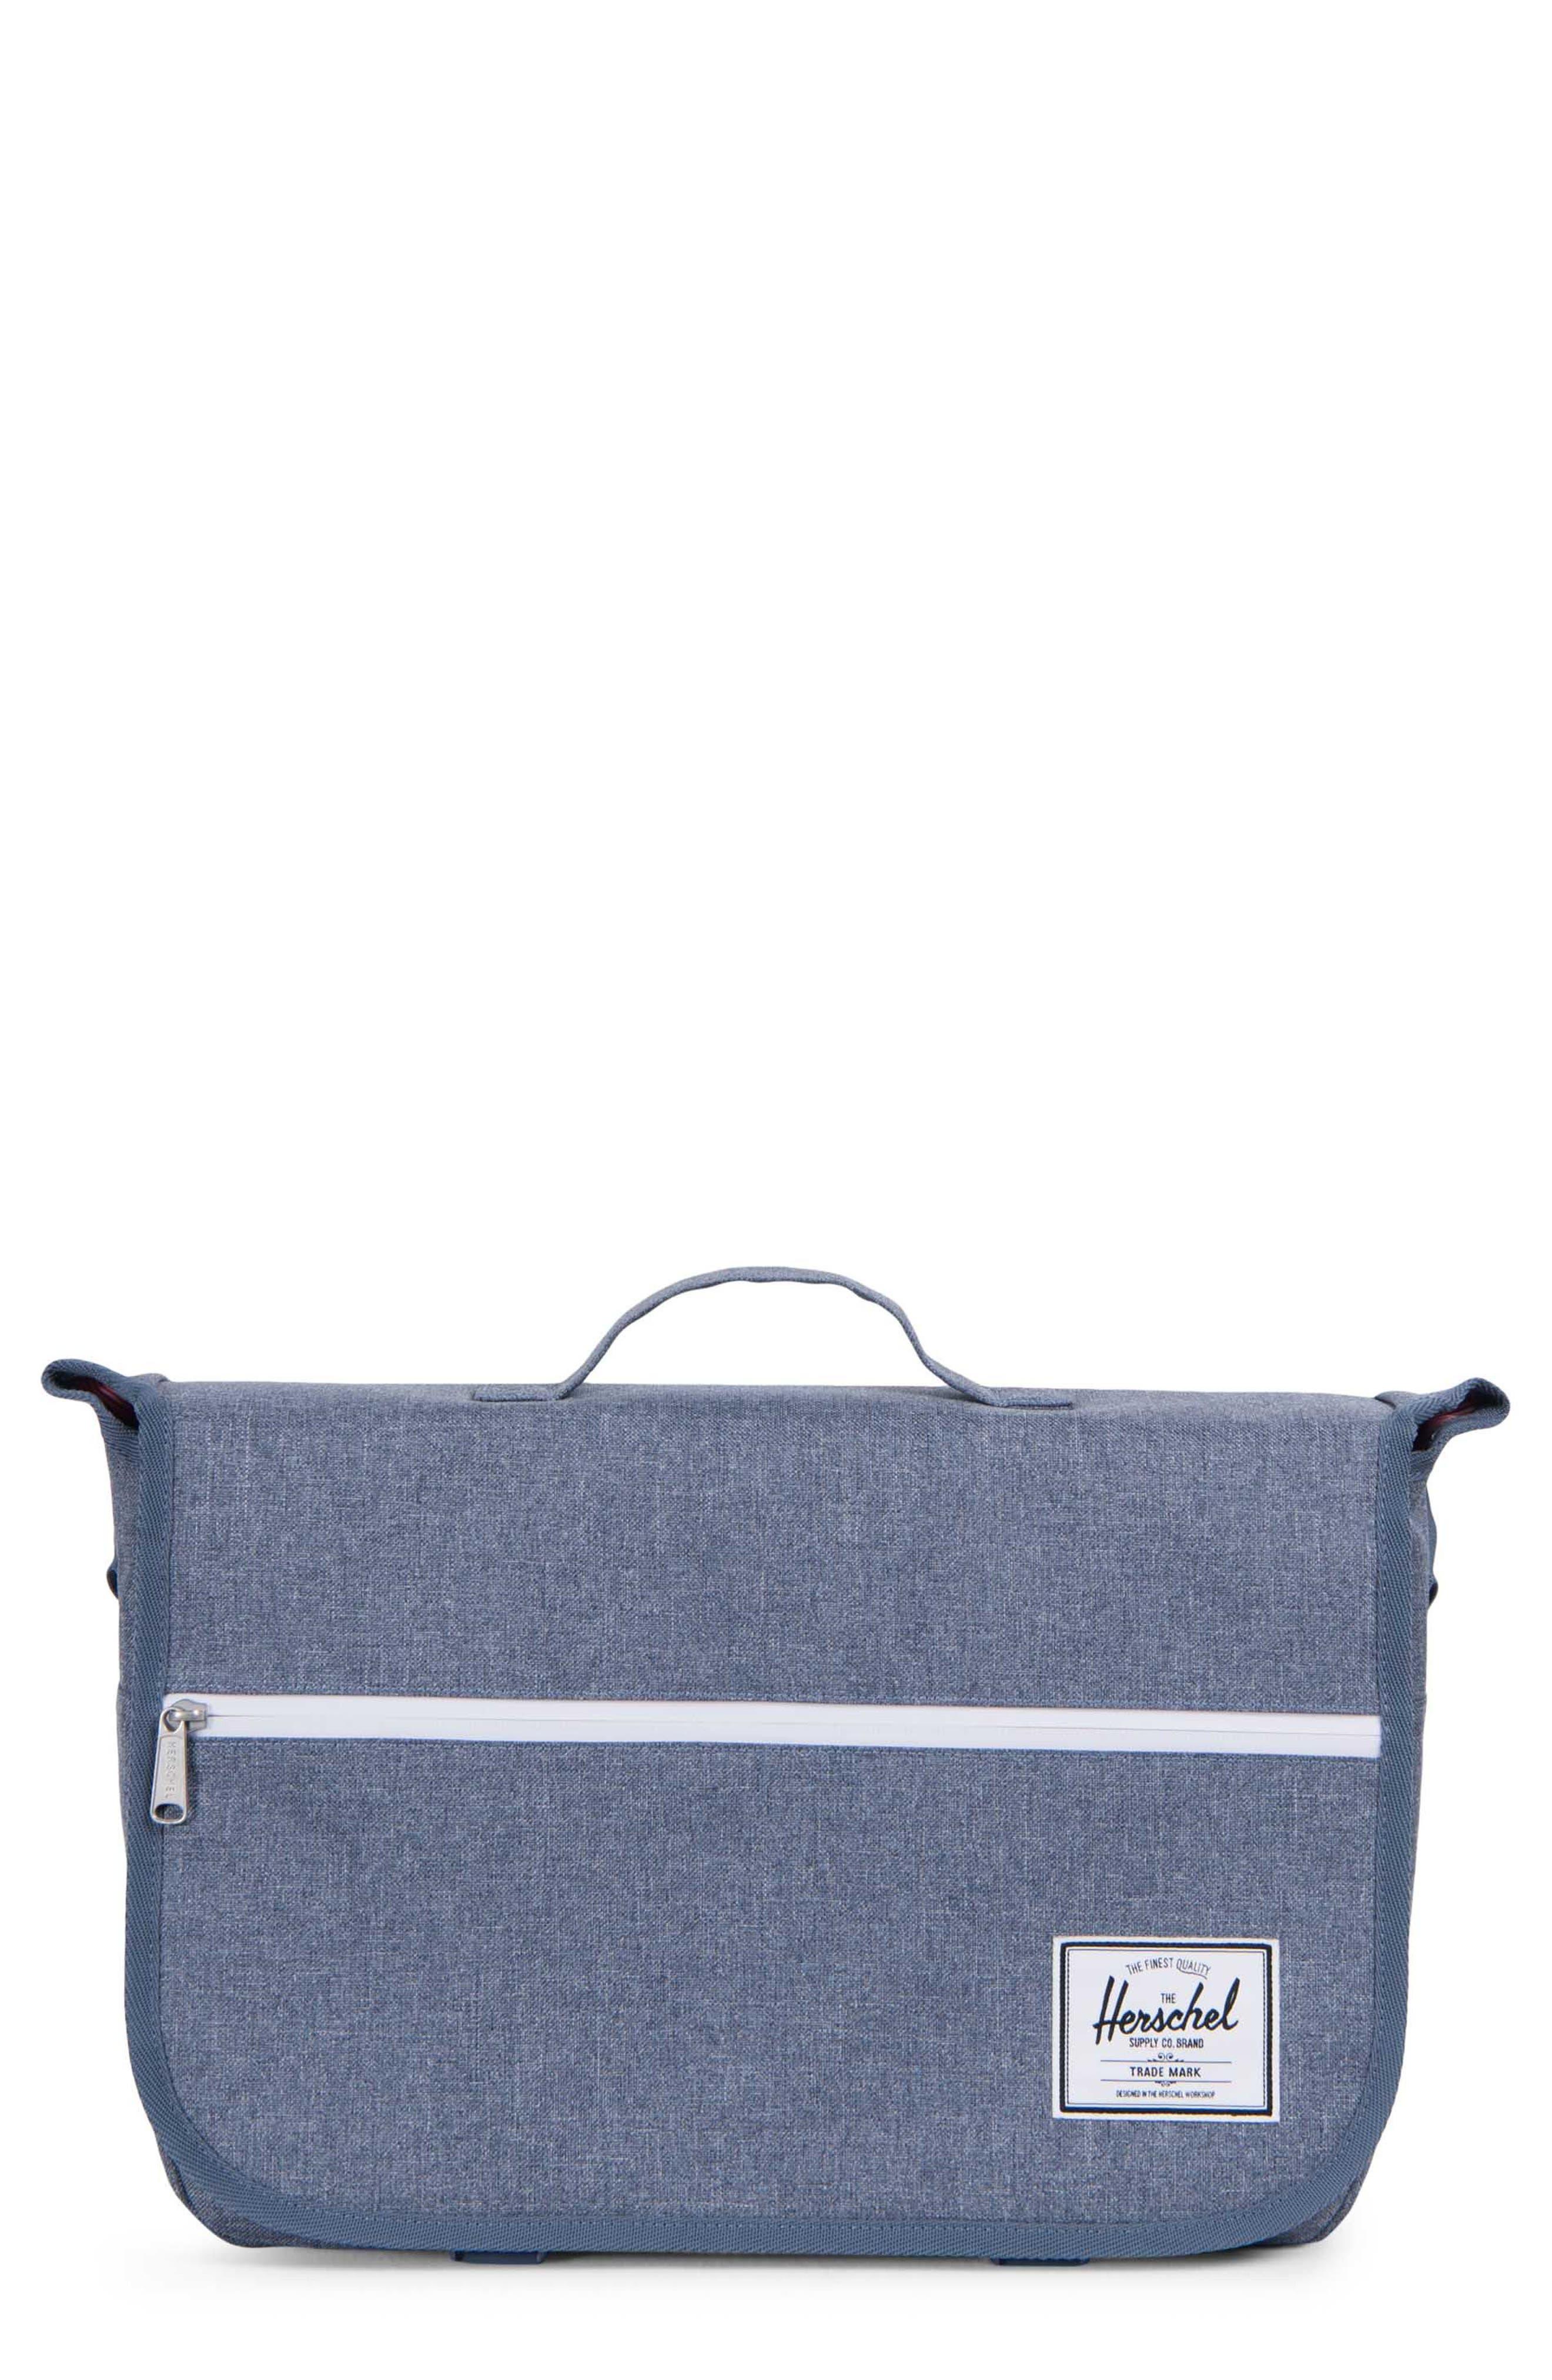 'Pop Quiz' Messenger Bag,                         Main,                         color, 462